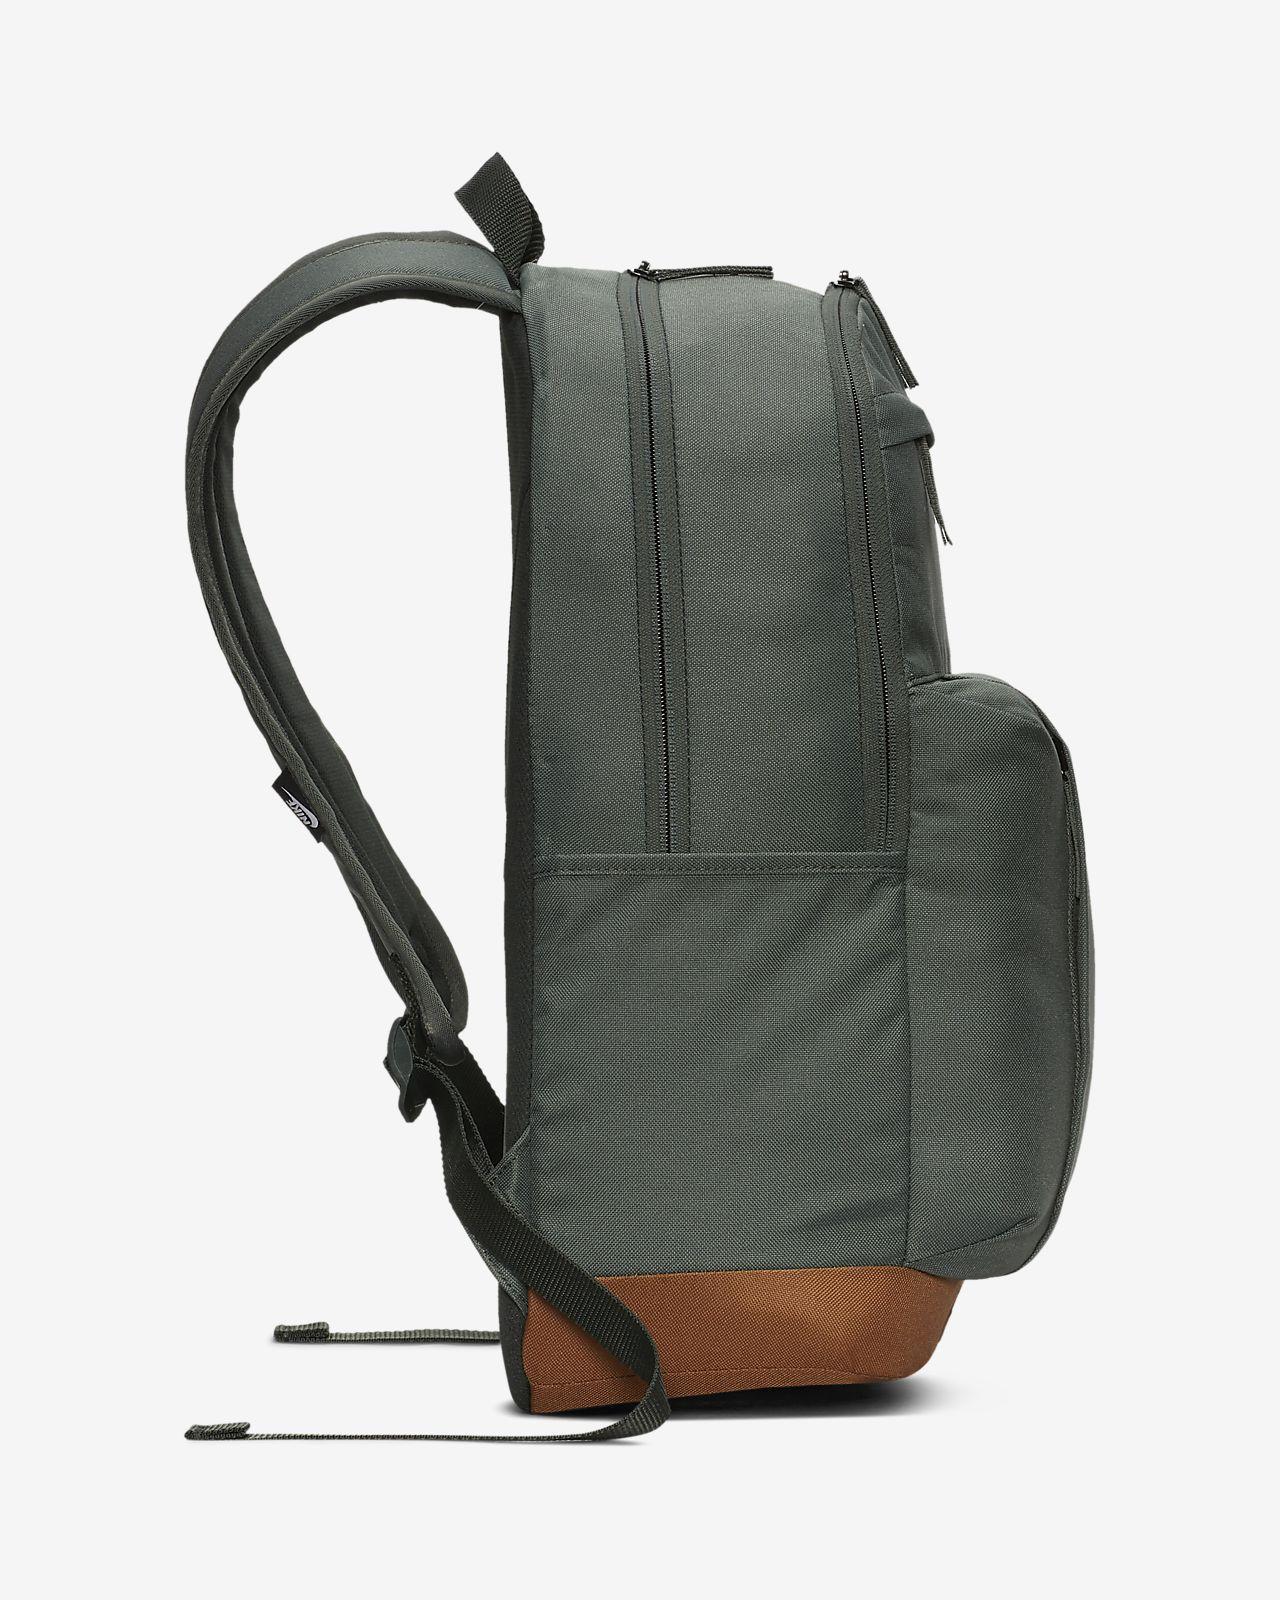 Low Resolution Nike Elemental Backpack Nike Elemental Backpack 3ec9437423490